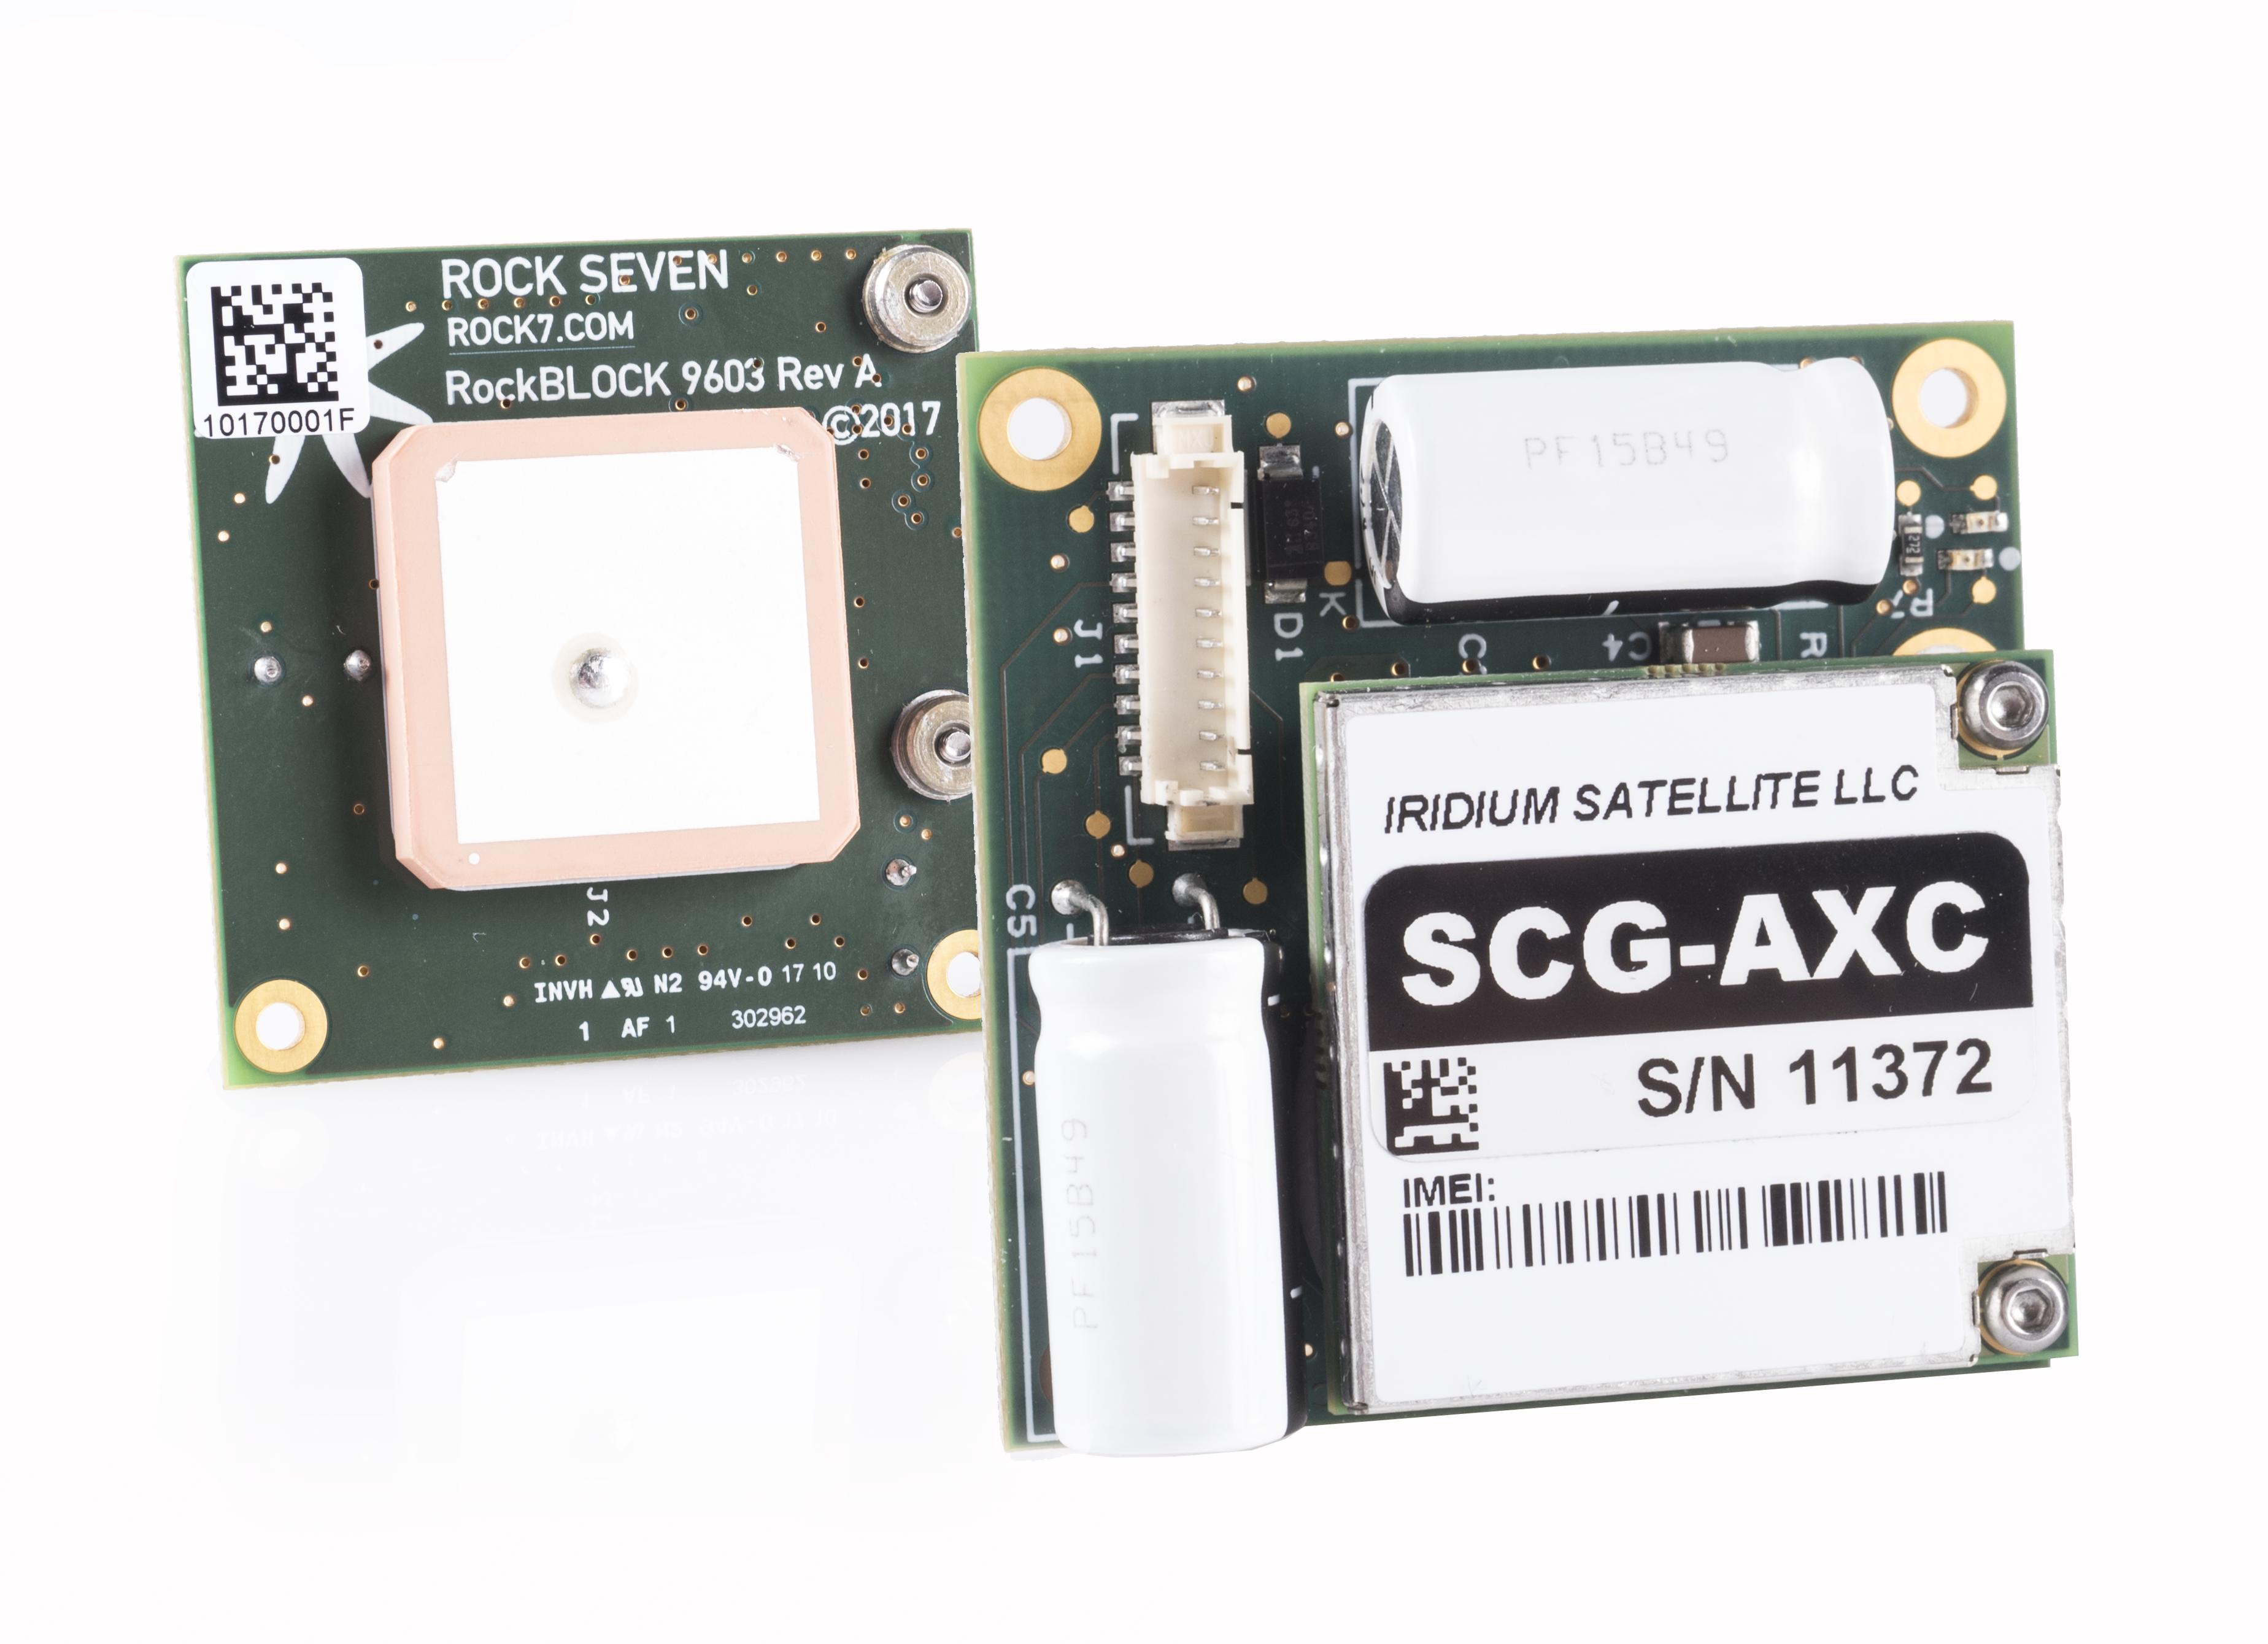 RockBlock 9603 2 way satelite communication device